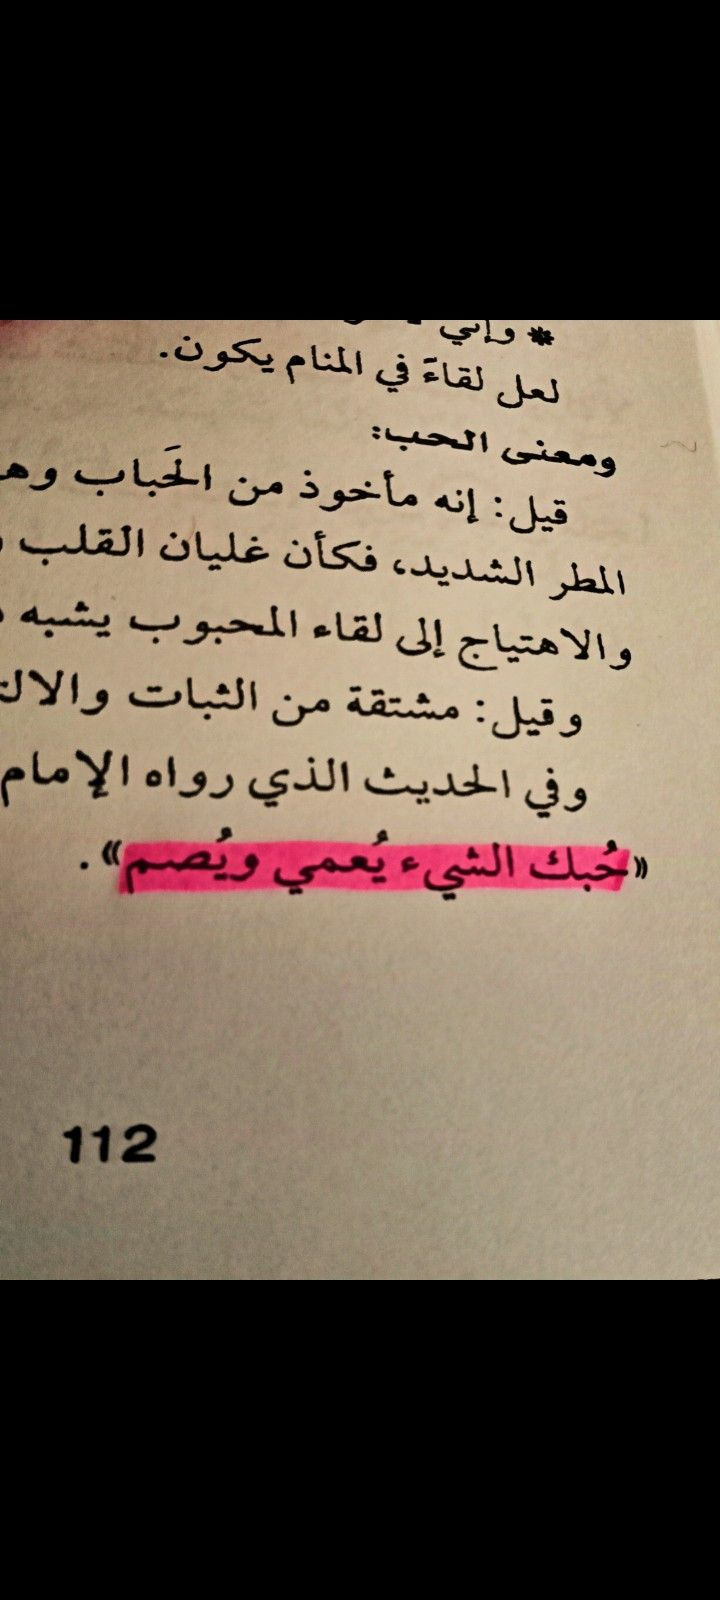 عمر ال عوضه الحب Arabic Calligraphy Calligraphy Arabic